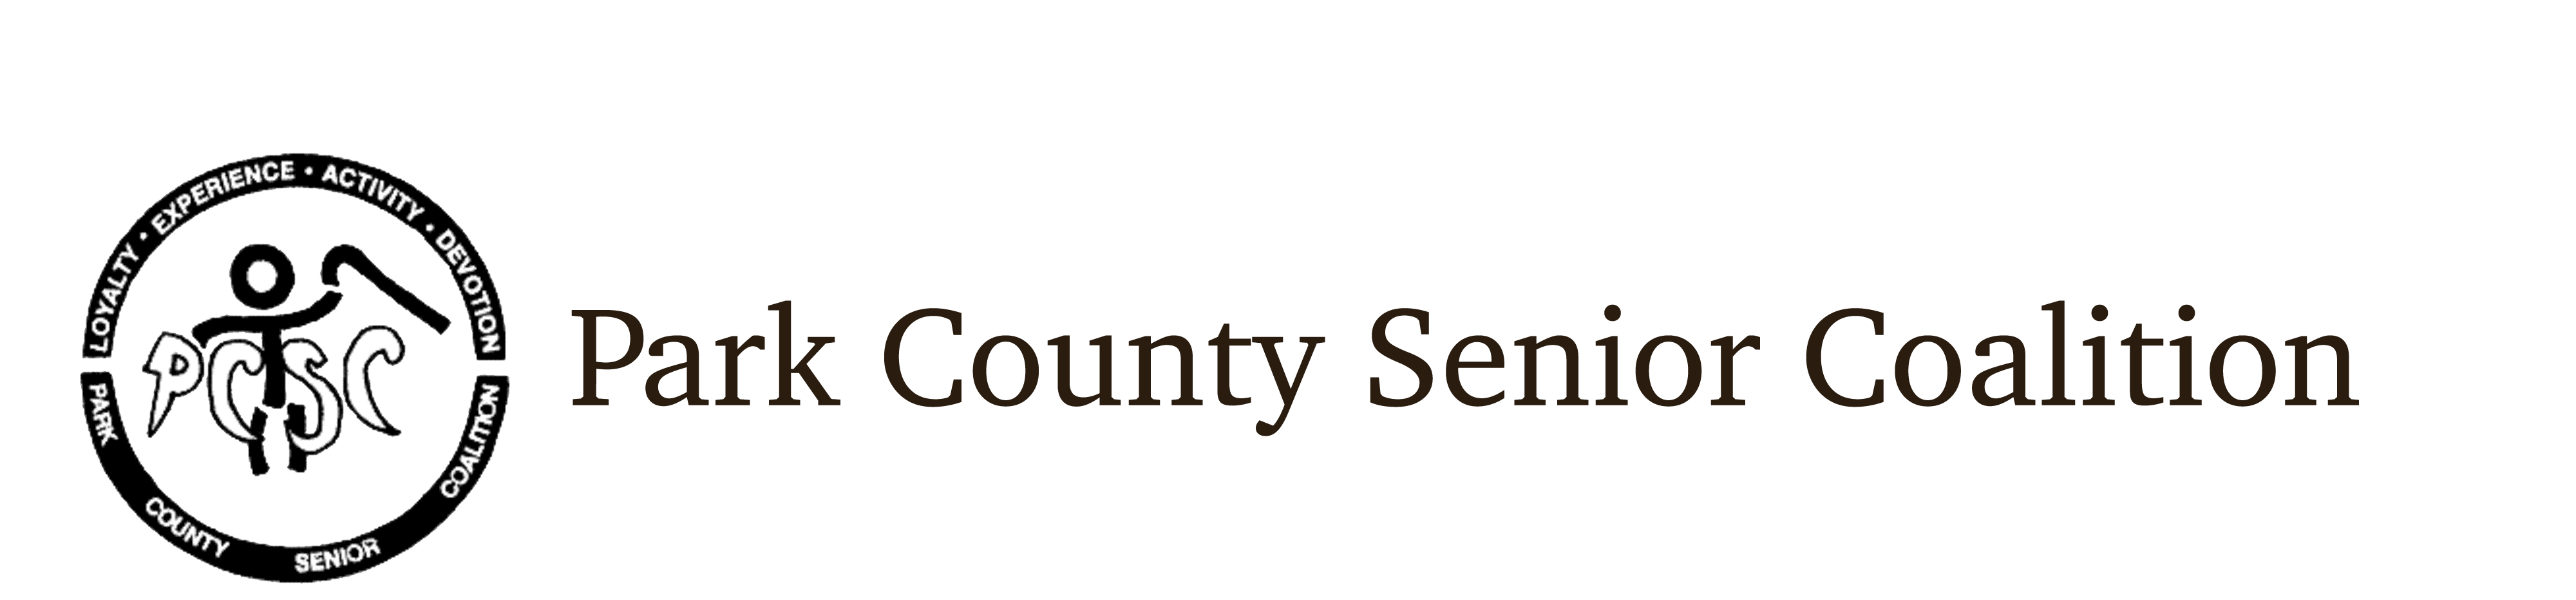 Park County Senior Coalition